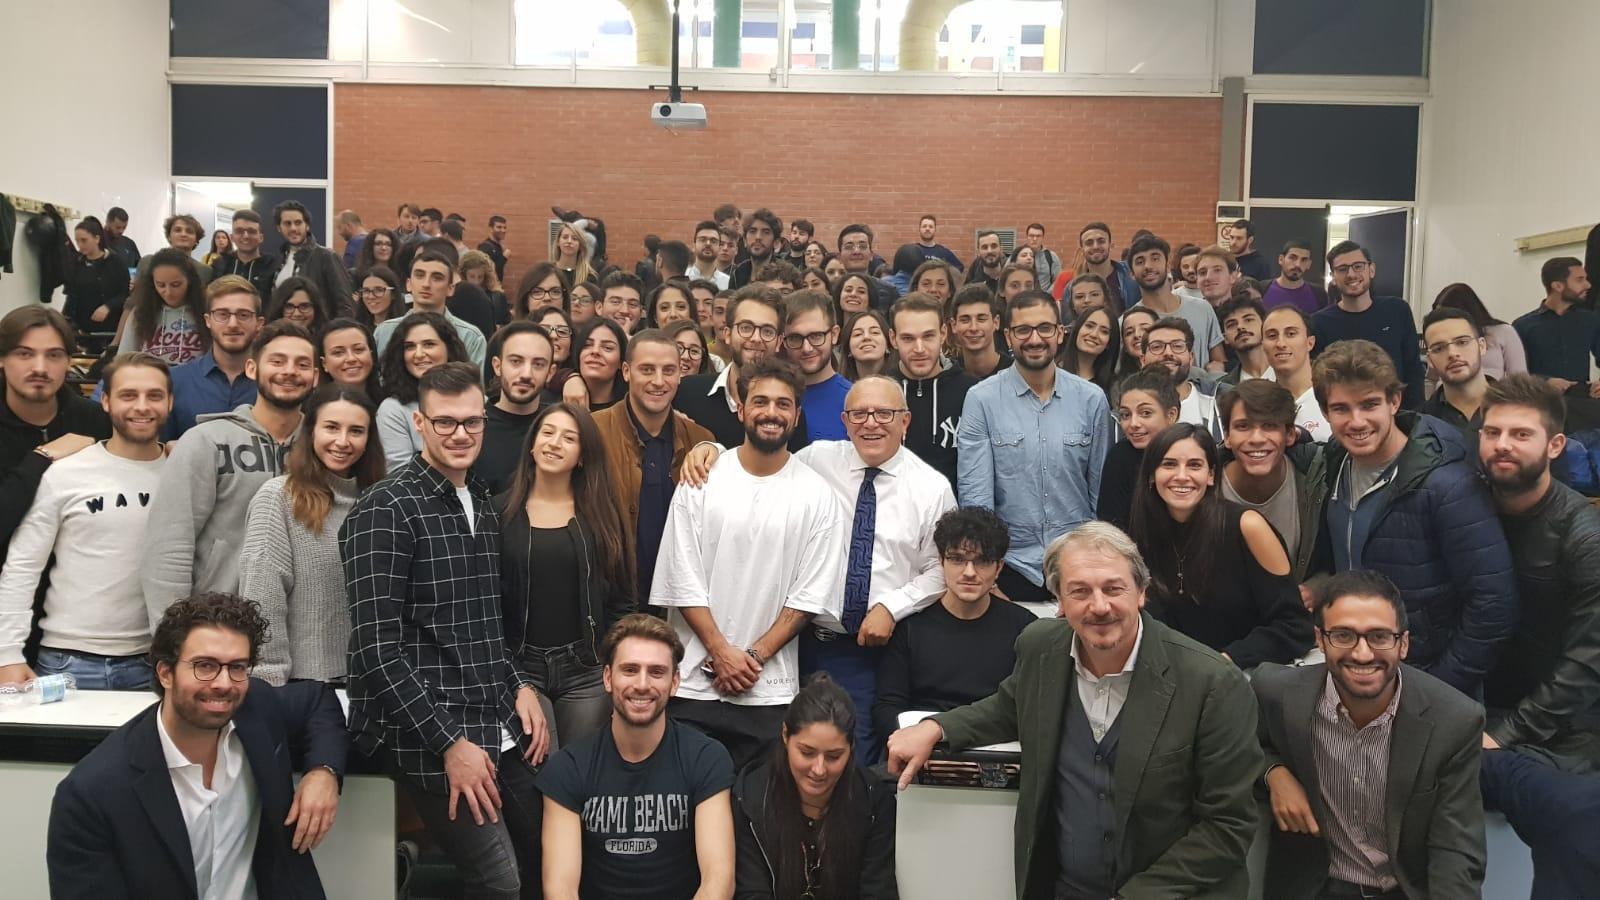 http://www.salernonotizie.net/wp-content/uploads/2018/11/Gubitosi-e-gli-studenti.jpg